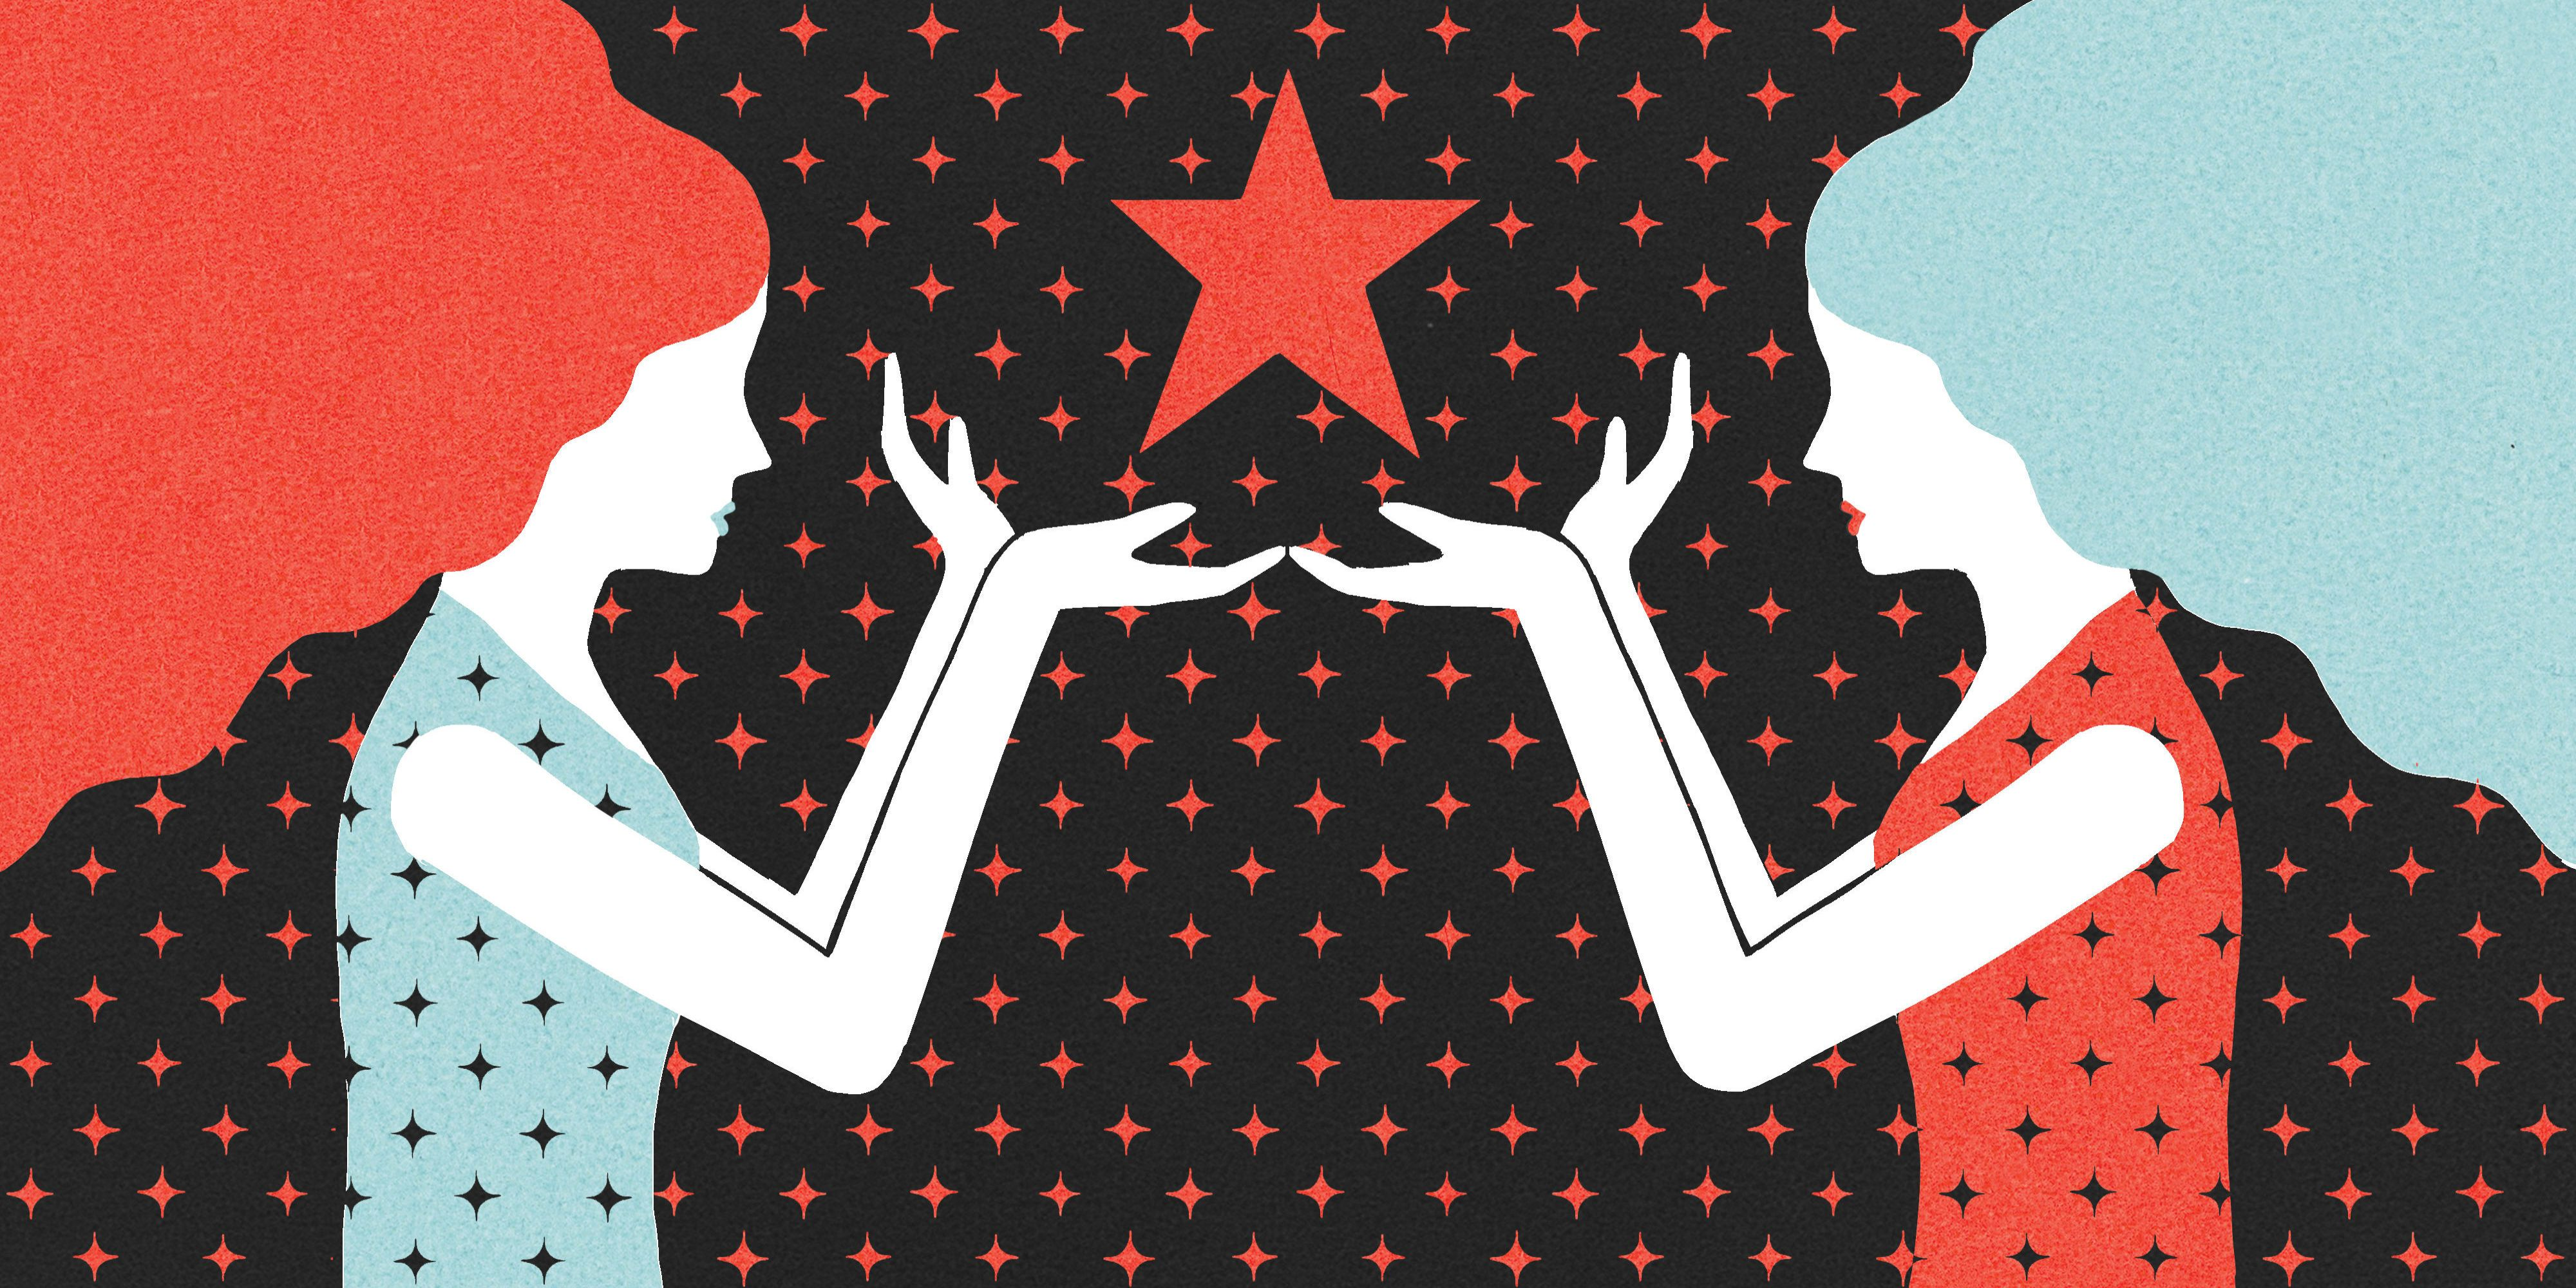 astro twins aries monthly horoscope